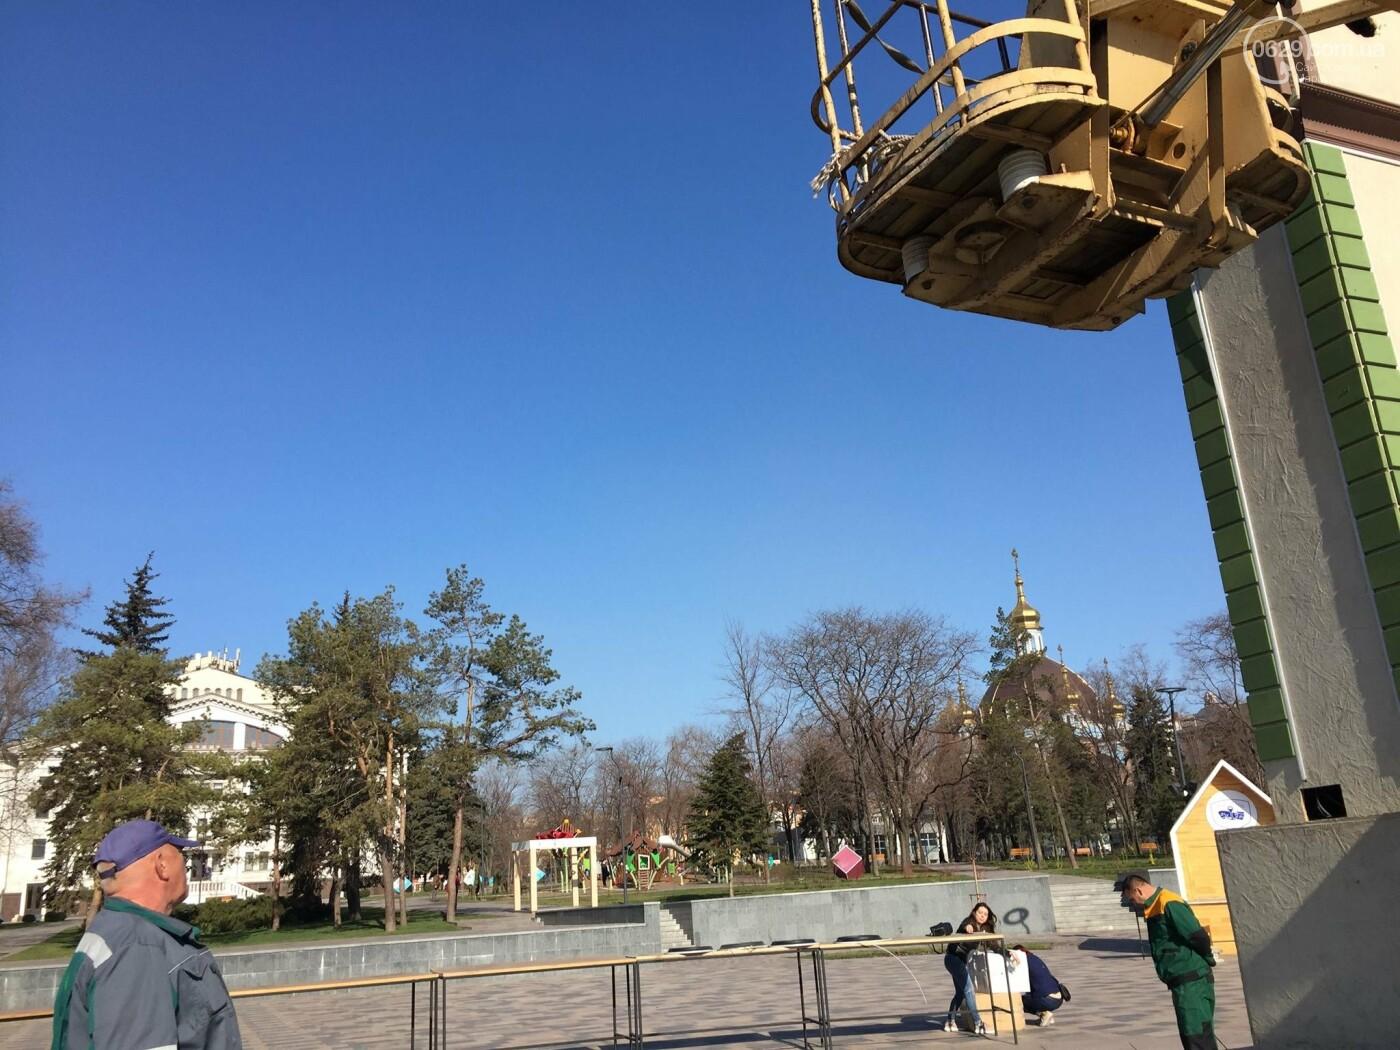 Мариупольцев оставят без башни с часами, - ФОТОФАКТ, фото-3